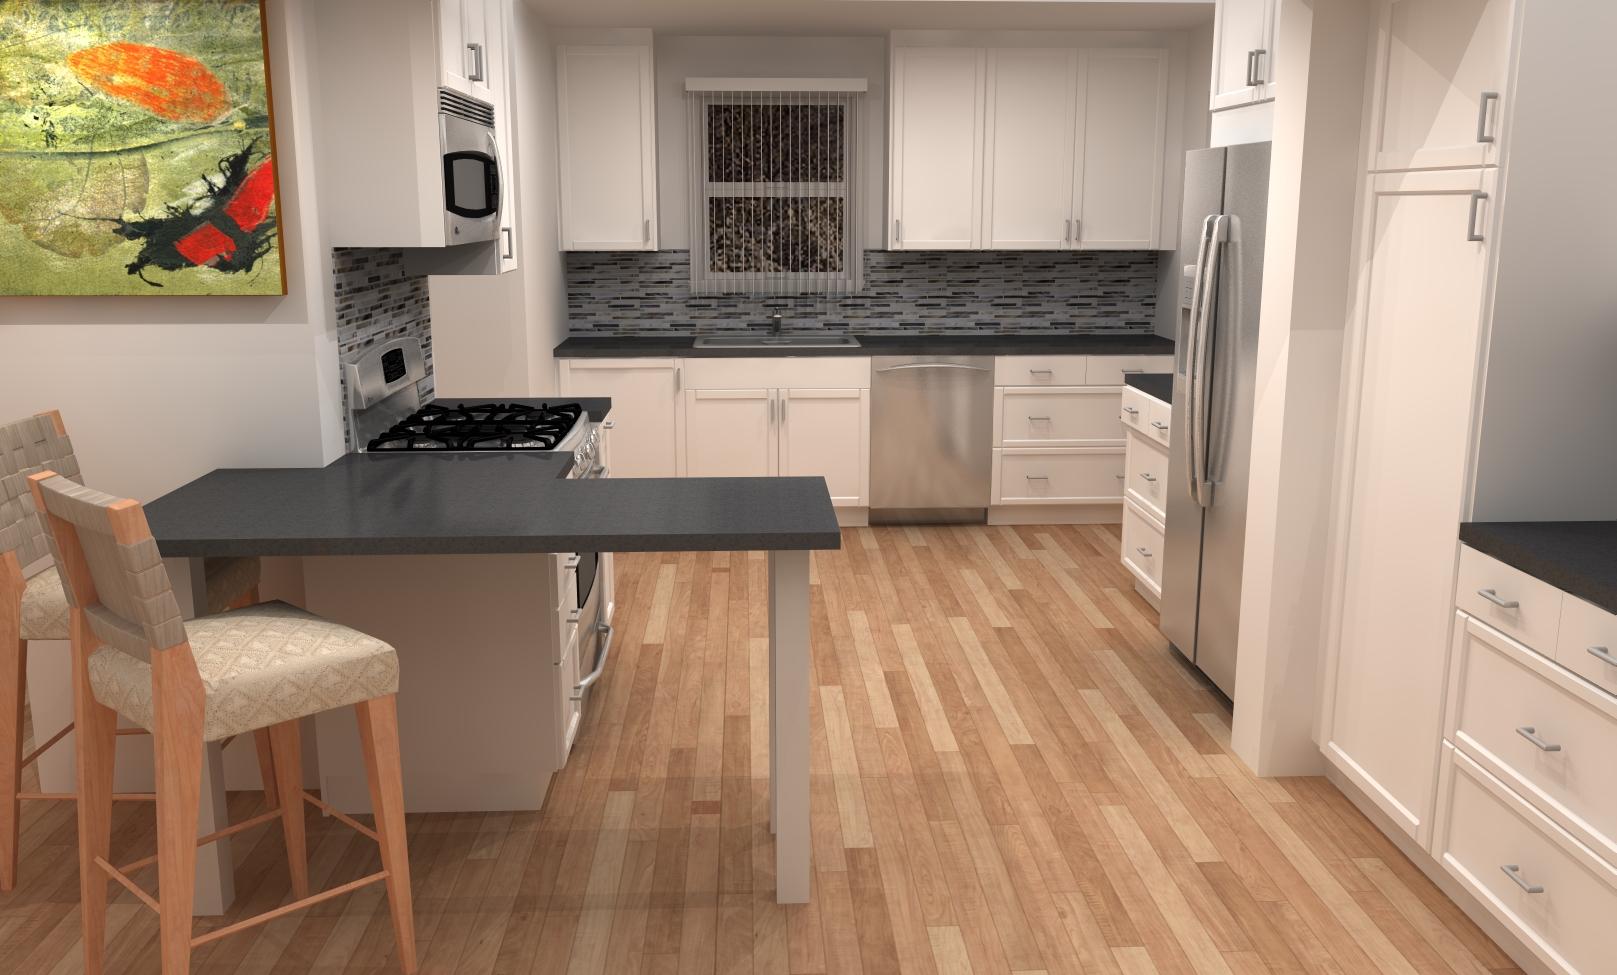 small kitchen remodel with ikea cabinets ikea kitchen remodel Finished ADEL kitchen white shaker IKEA cabinets